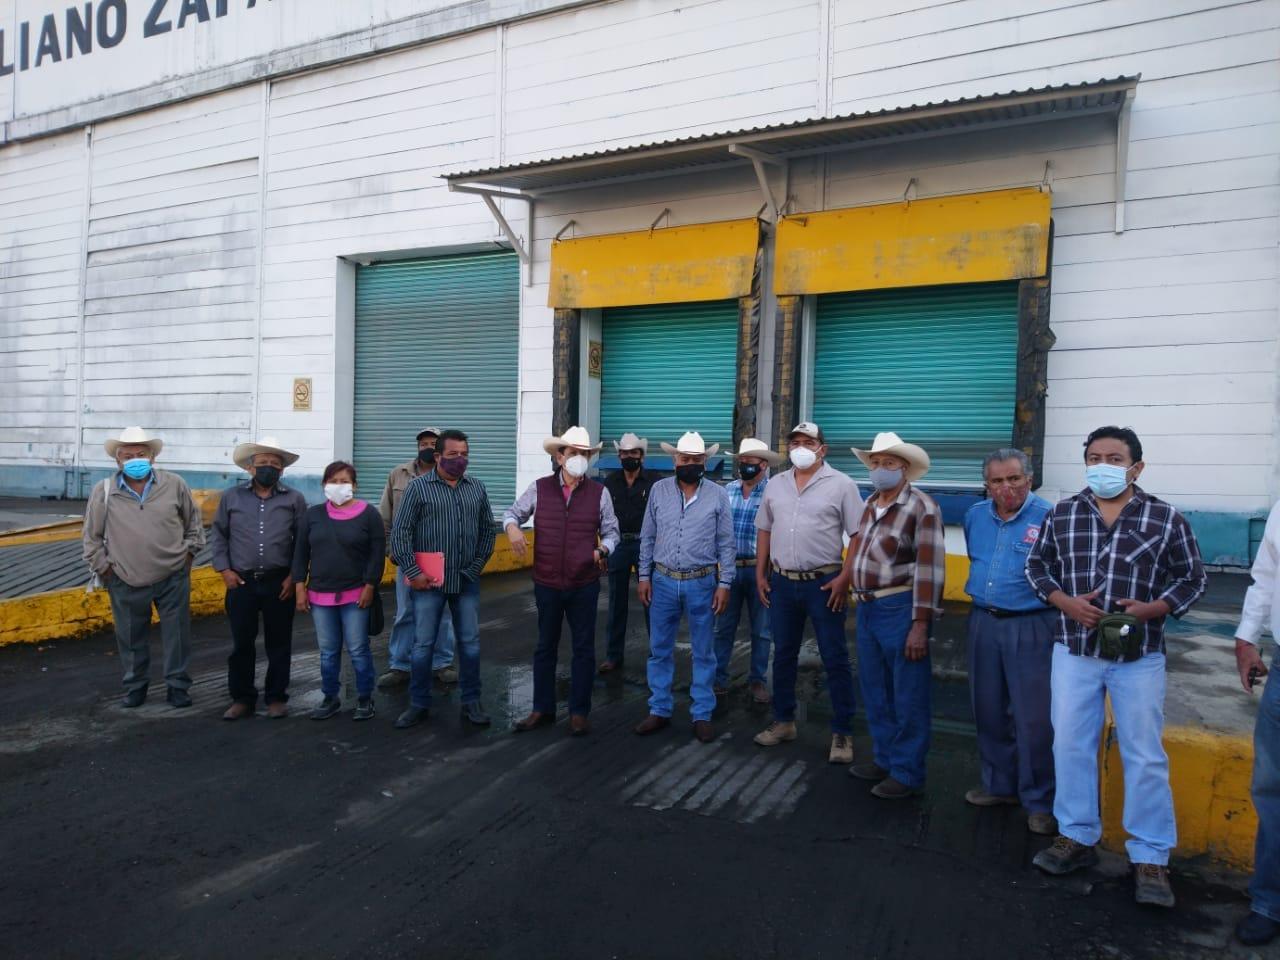 Gente de Amado Orihuela Trejo toman bodegas del Ingenio Emiliano Zapata de Zacatepec